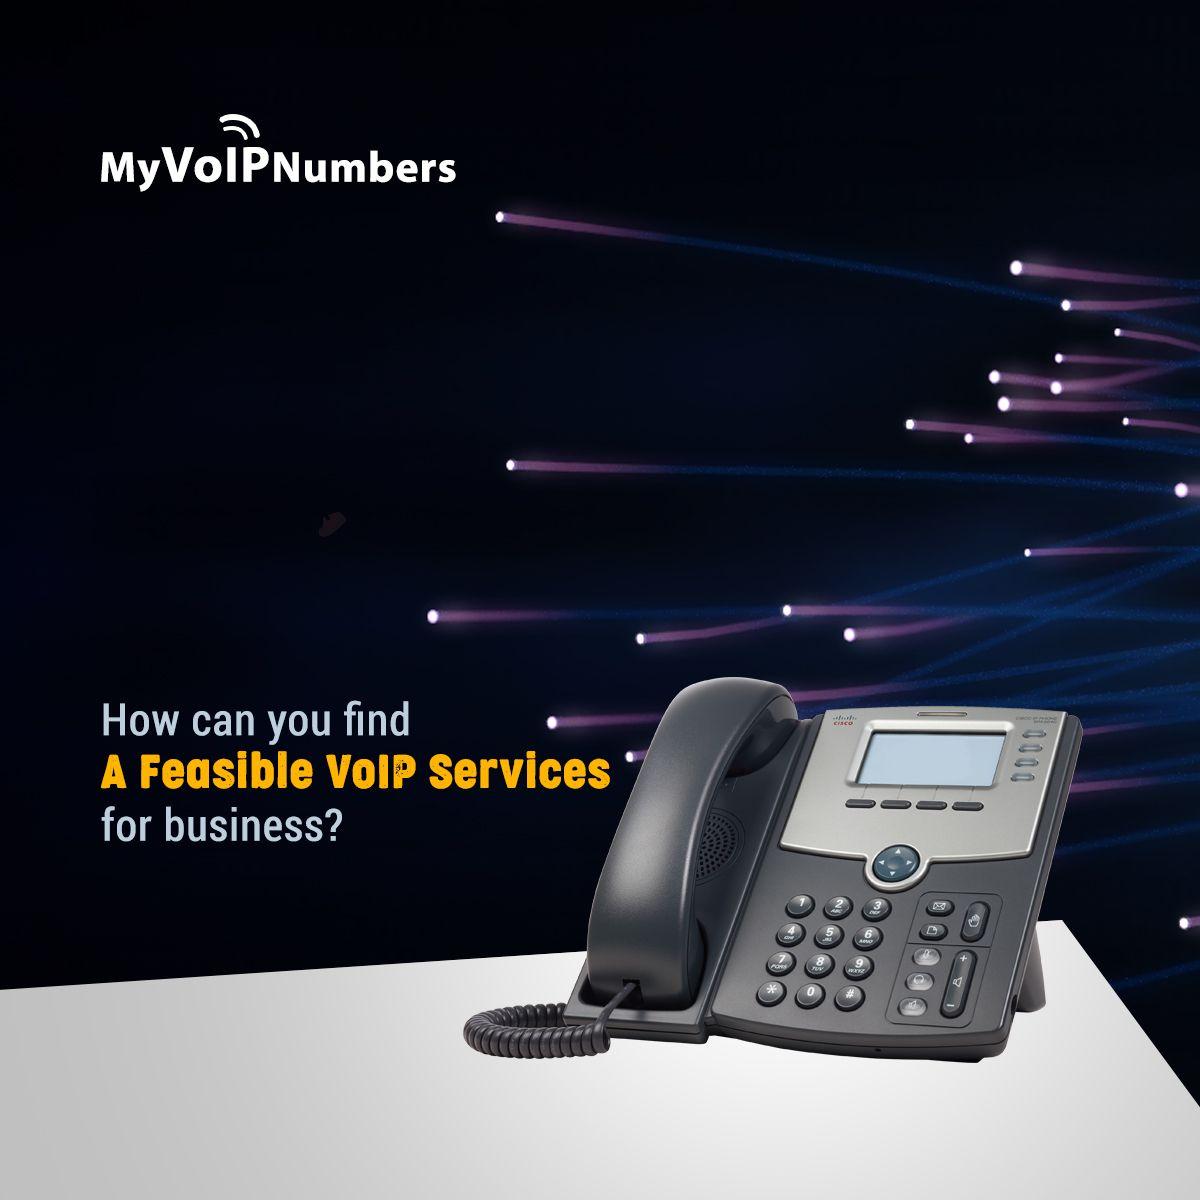 VoIP Services Voip, Voip phone service, Phone service